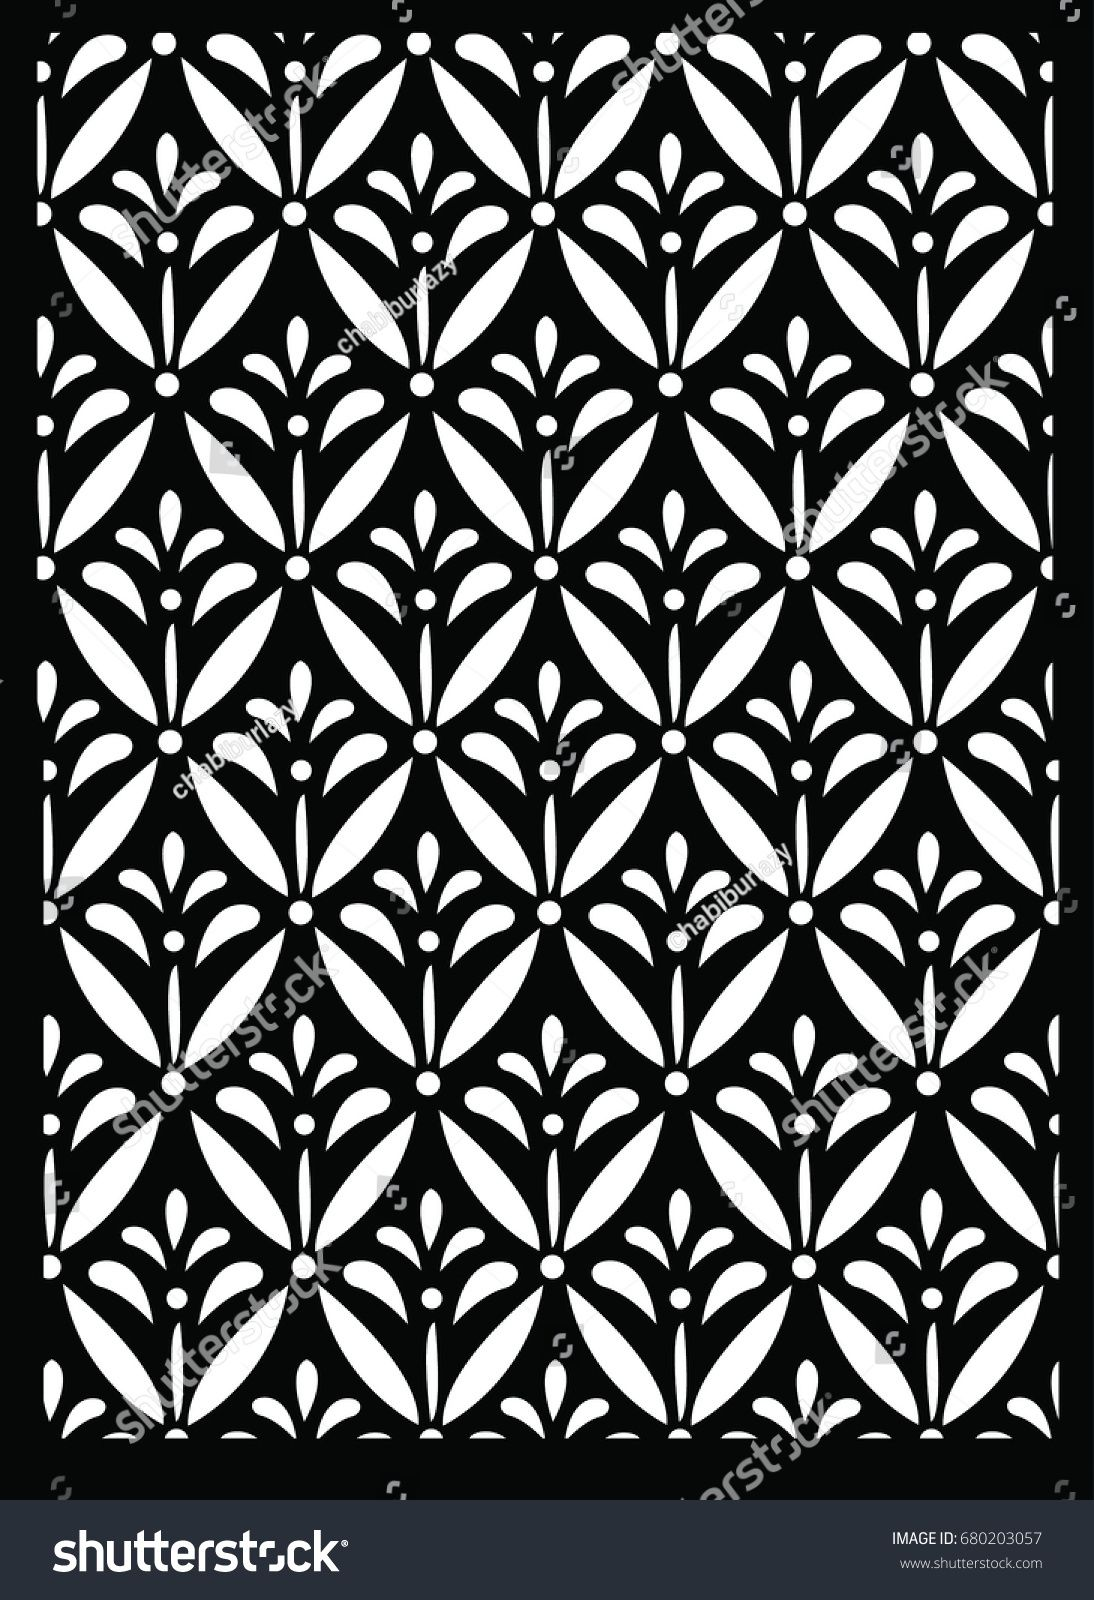 clipart black and white download Vector color stock. Kawung indonesian batik black